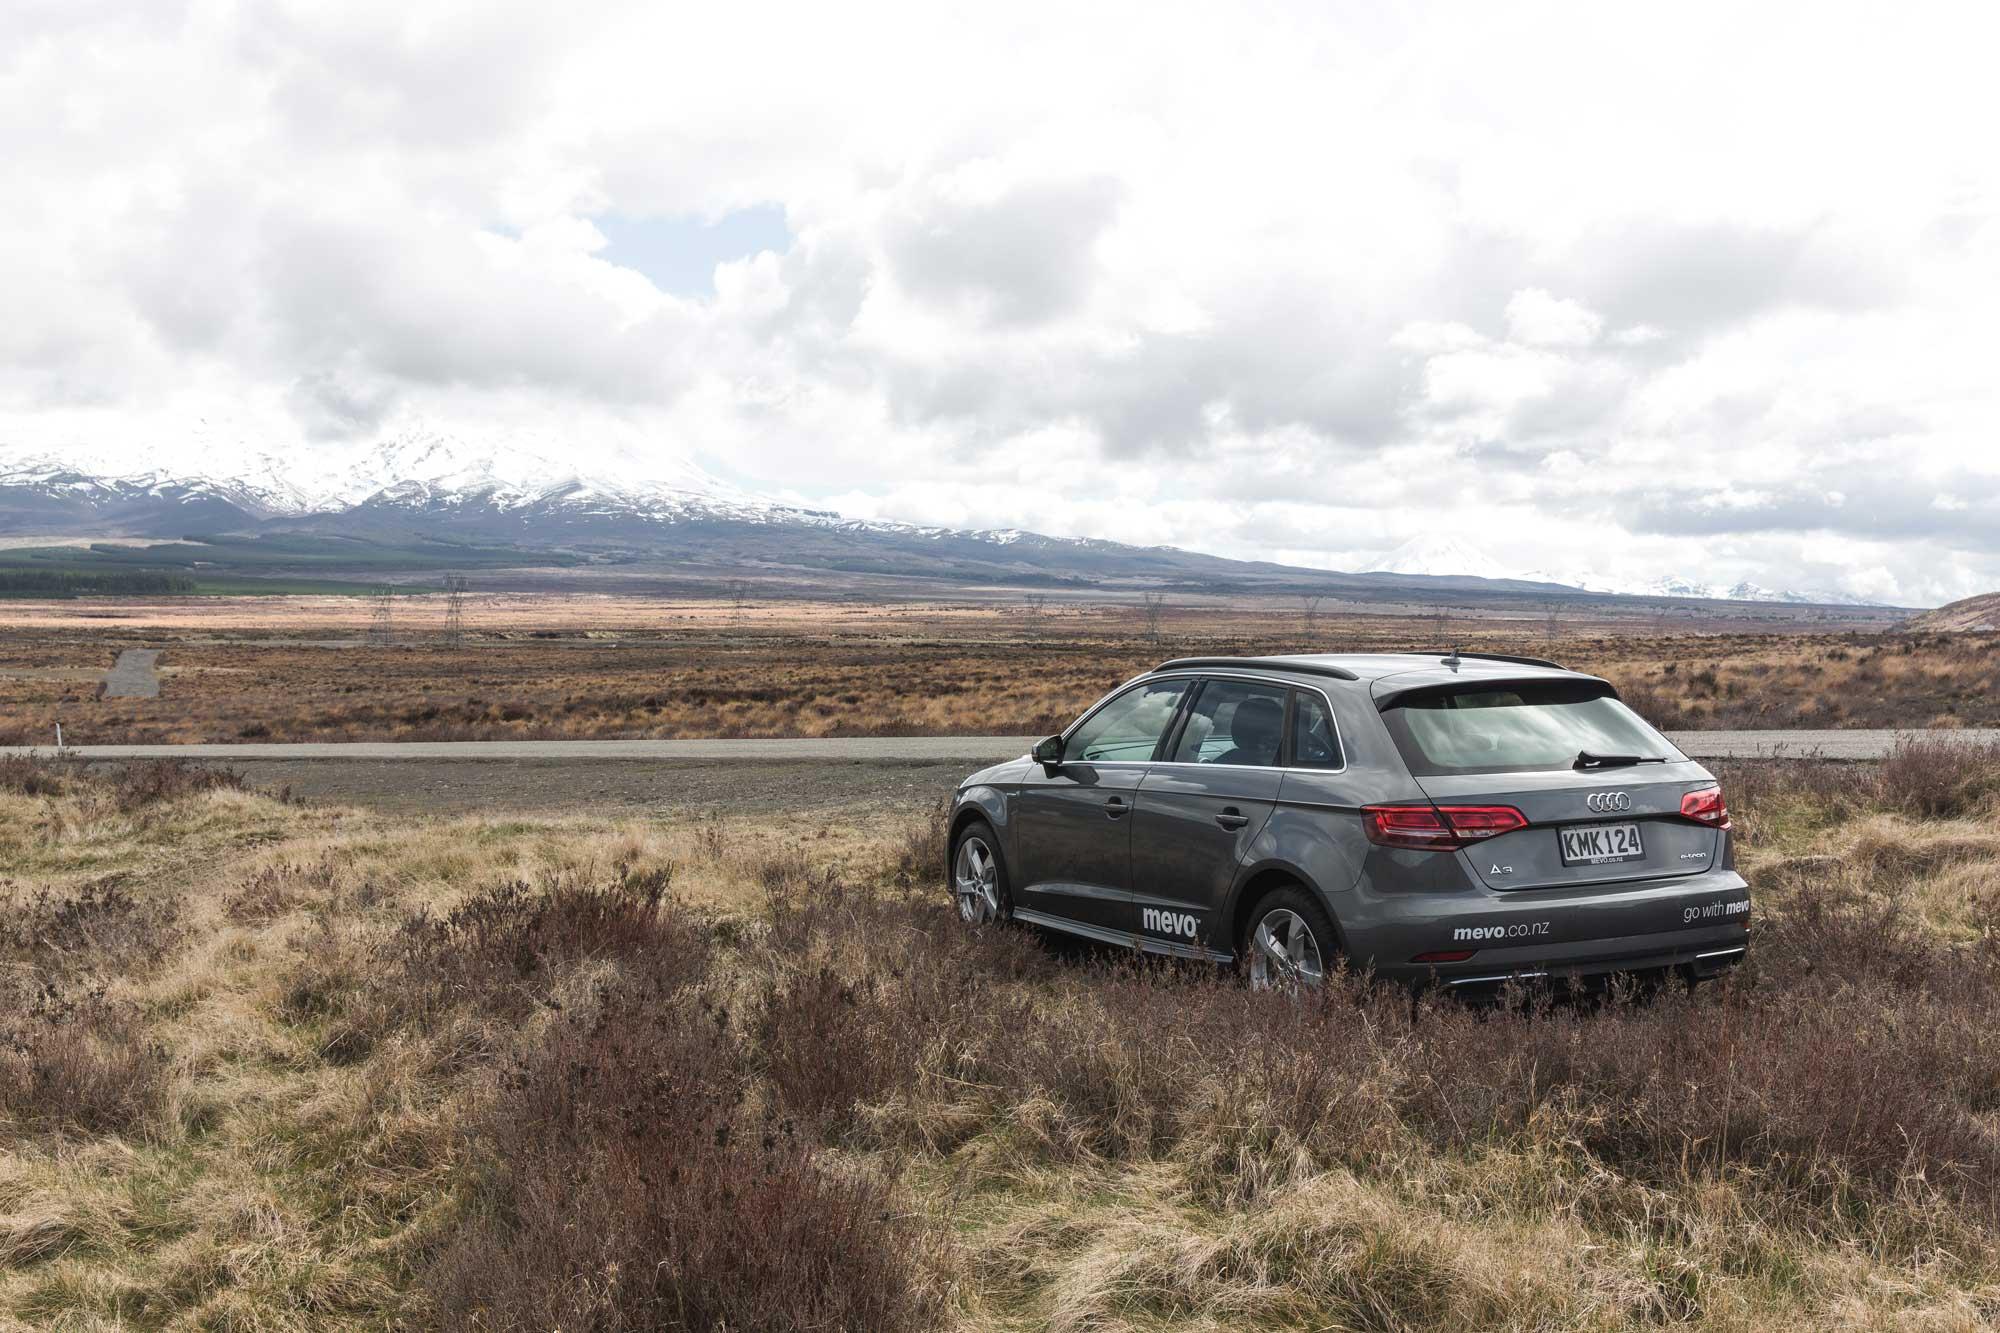 Audi A3 e-tron parked near the desert road